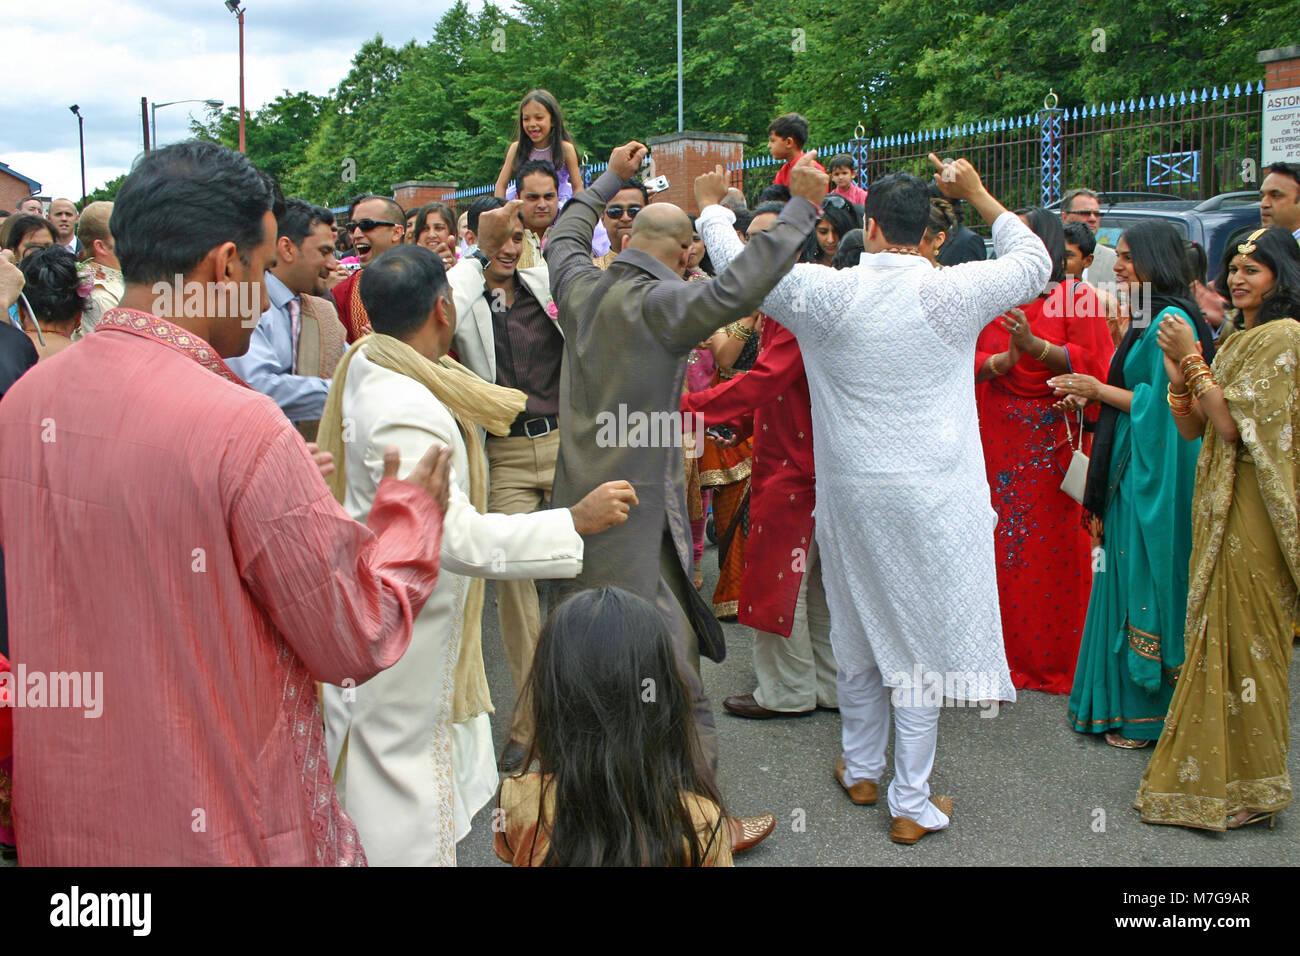 Men dancing at Asian wedding, at Villa Park, Birmingham - Stock Image